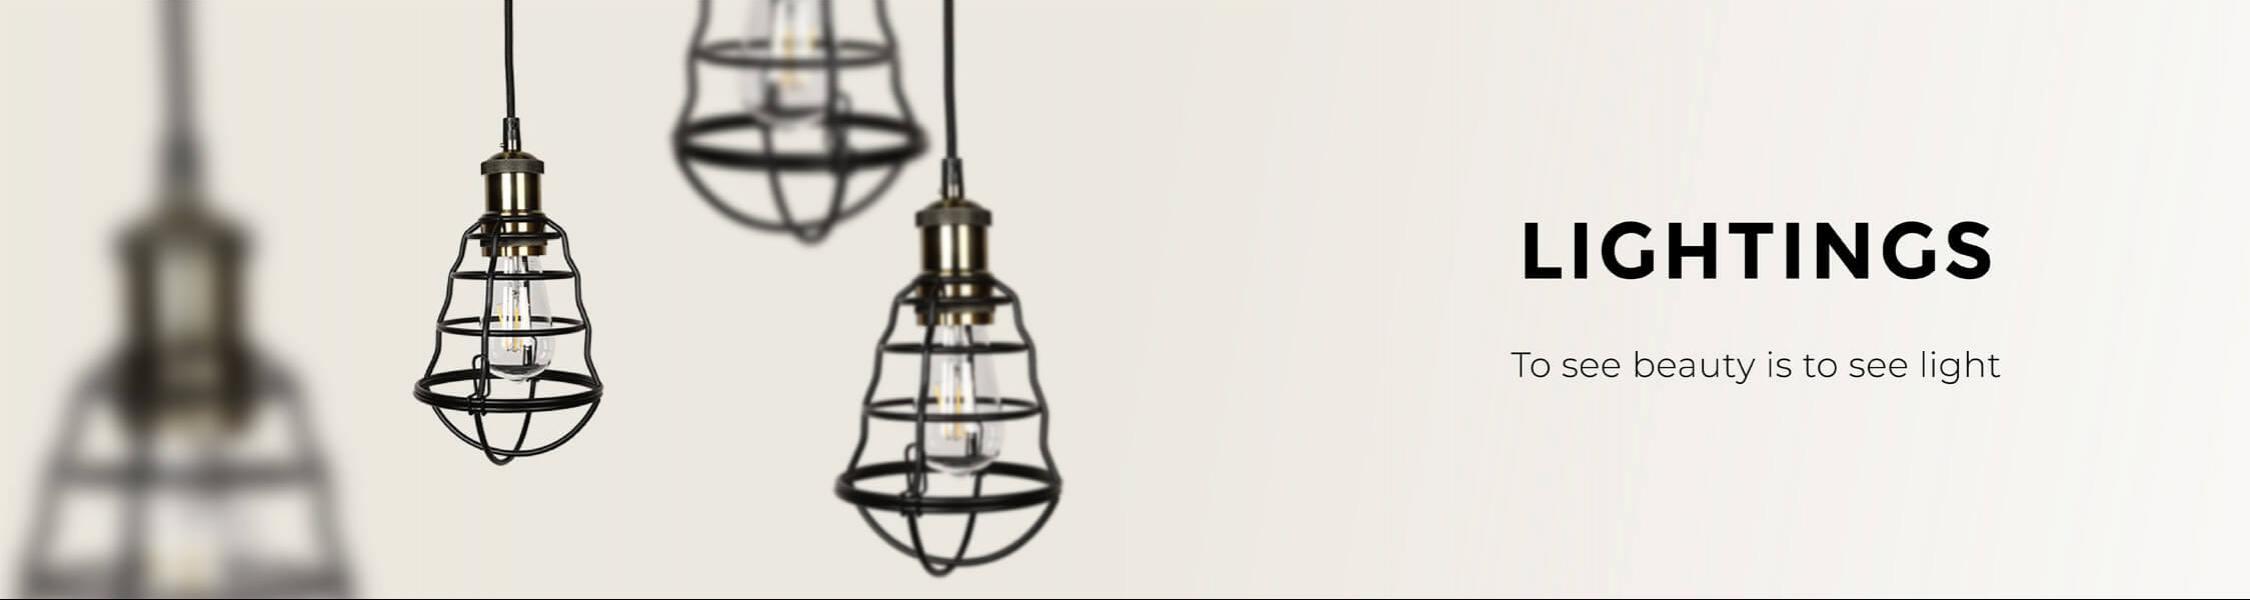 Lights & Bulbs